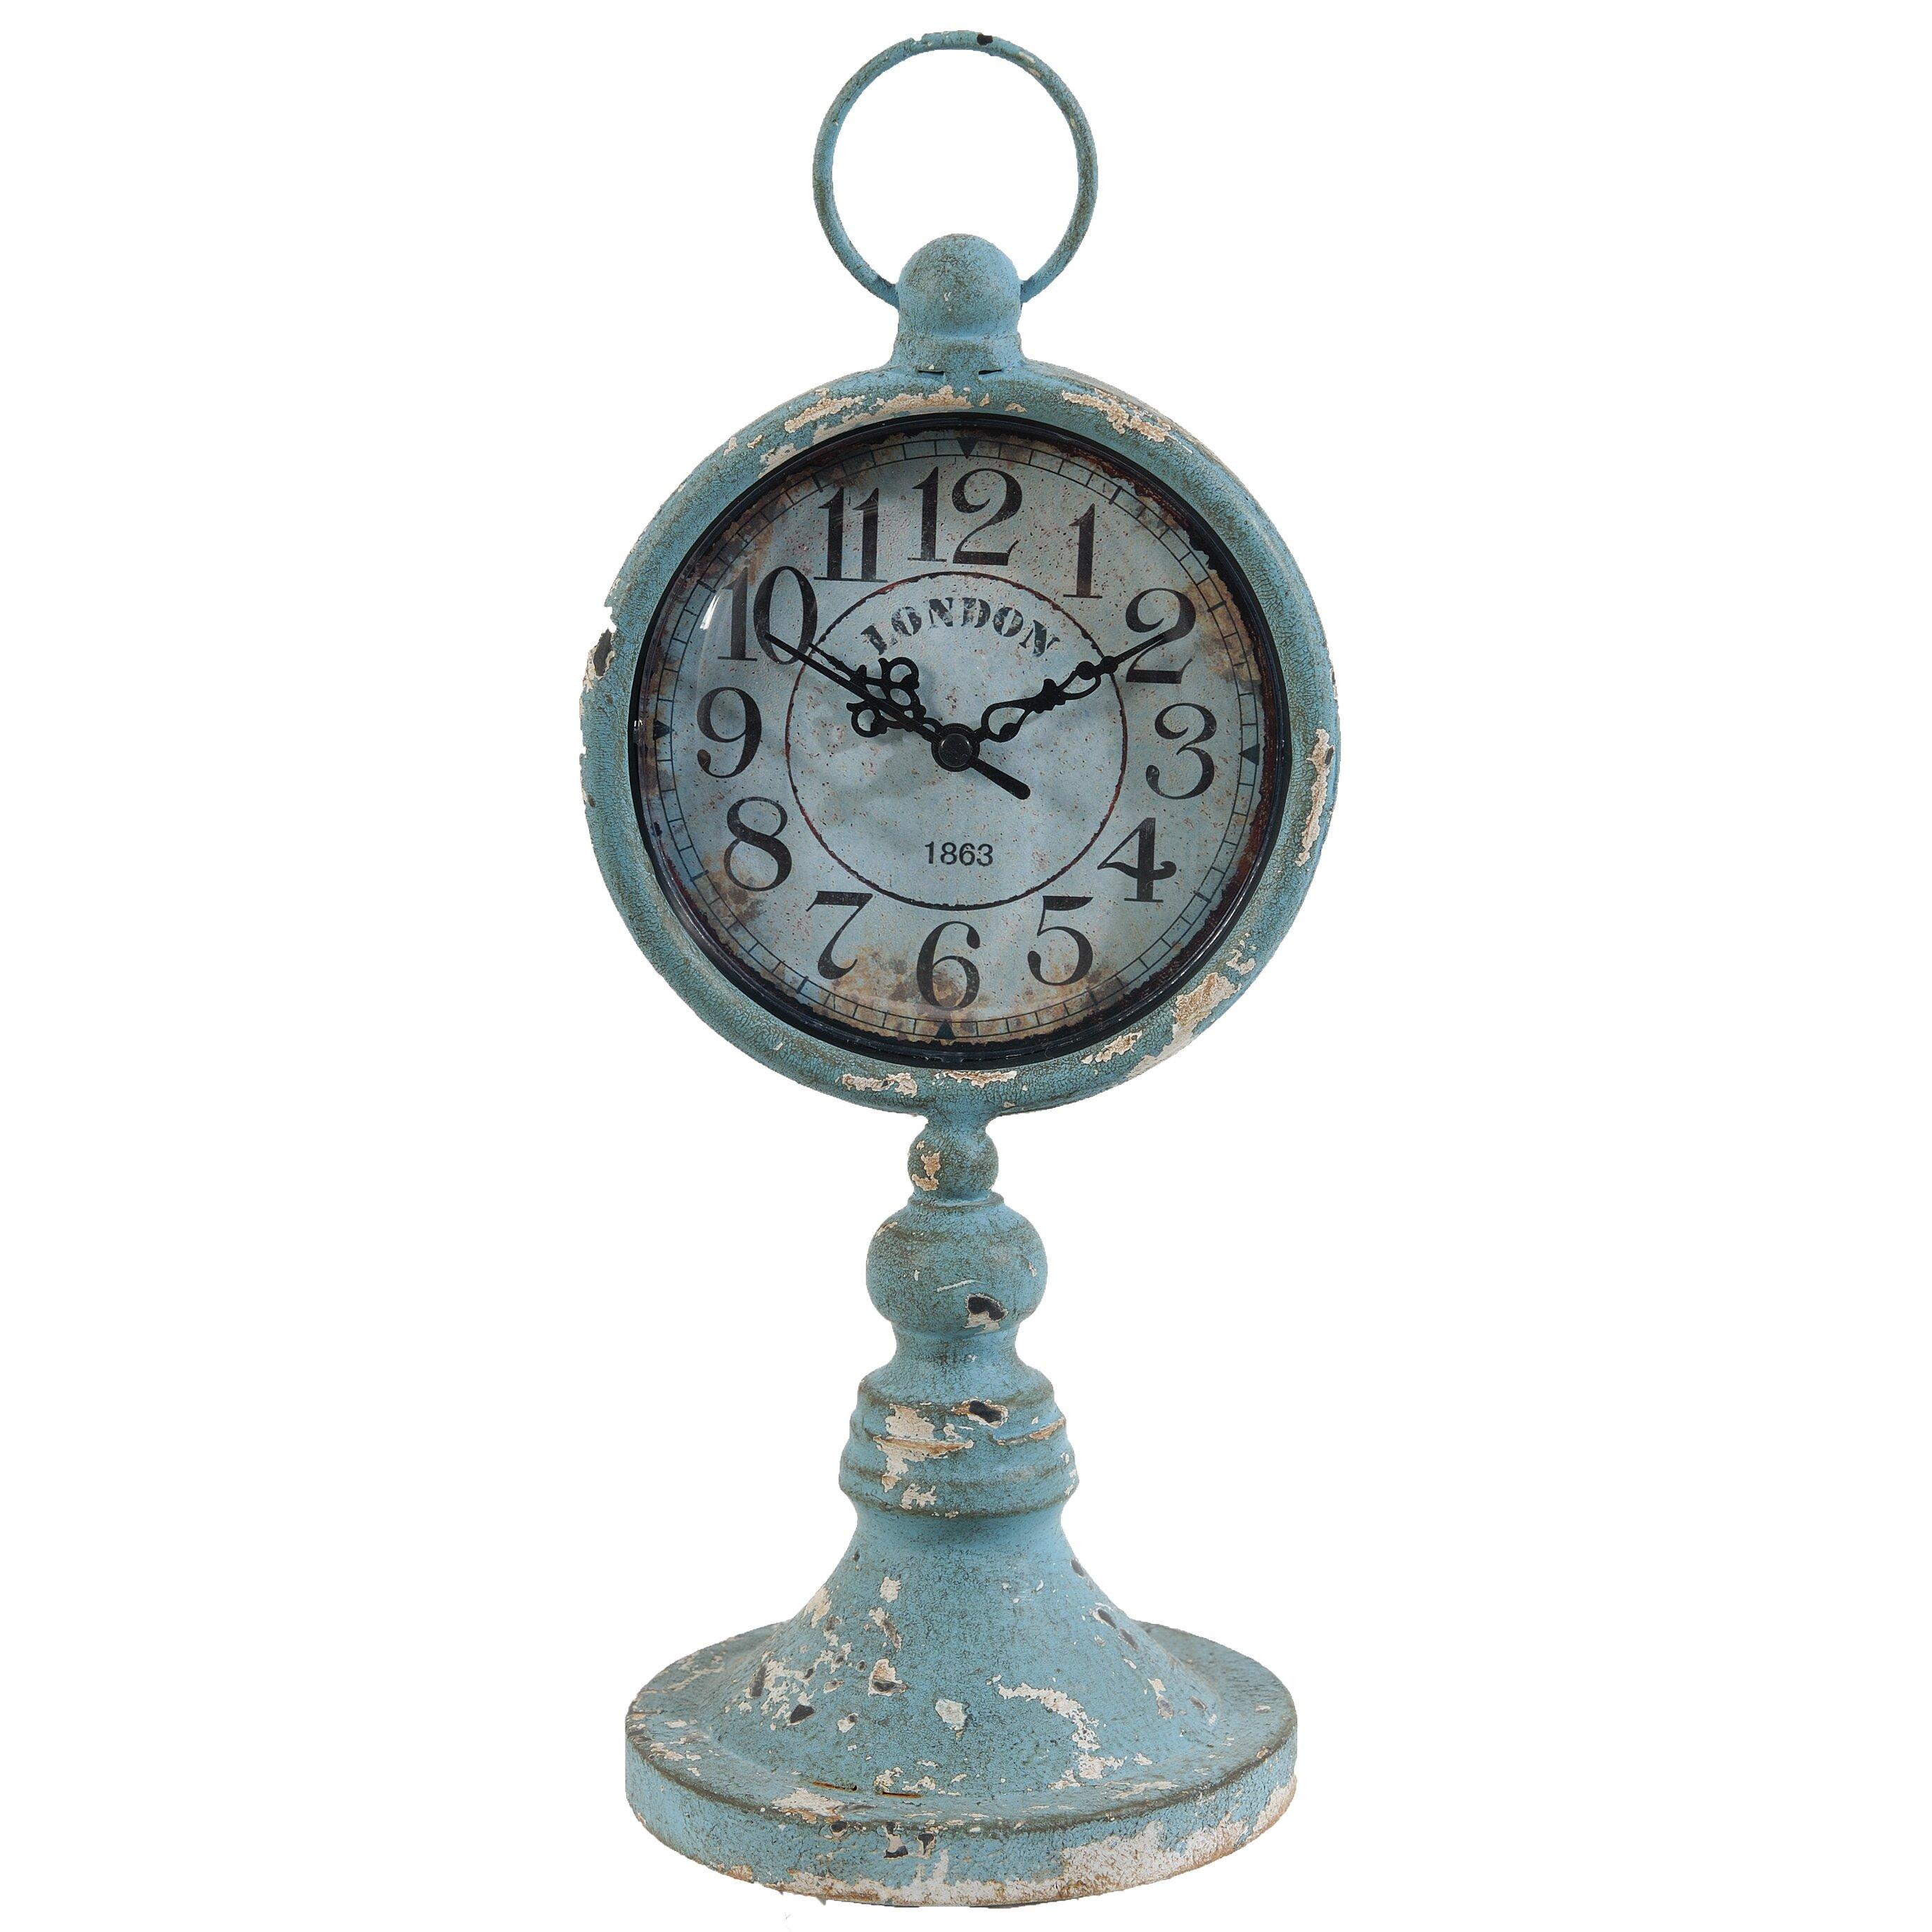 AampB Home Table Clock amp Reviews Wayfair : LondonTableClock from www.wayfair.com size 2748 x 2748 jpeg 544kB